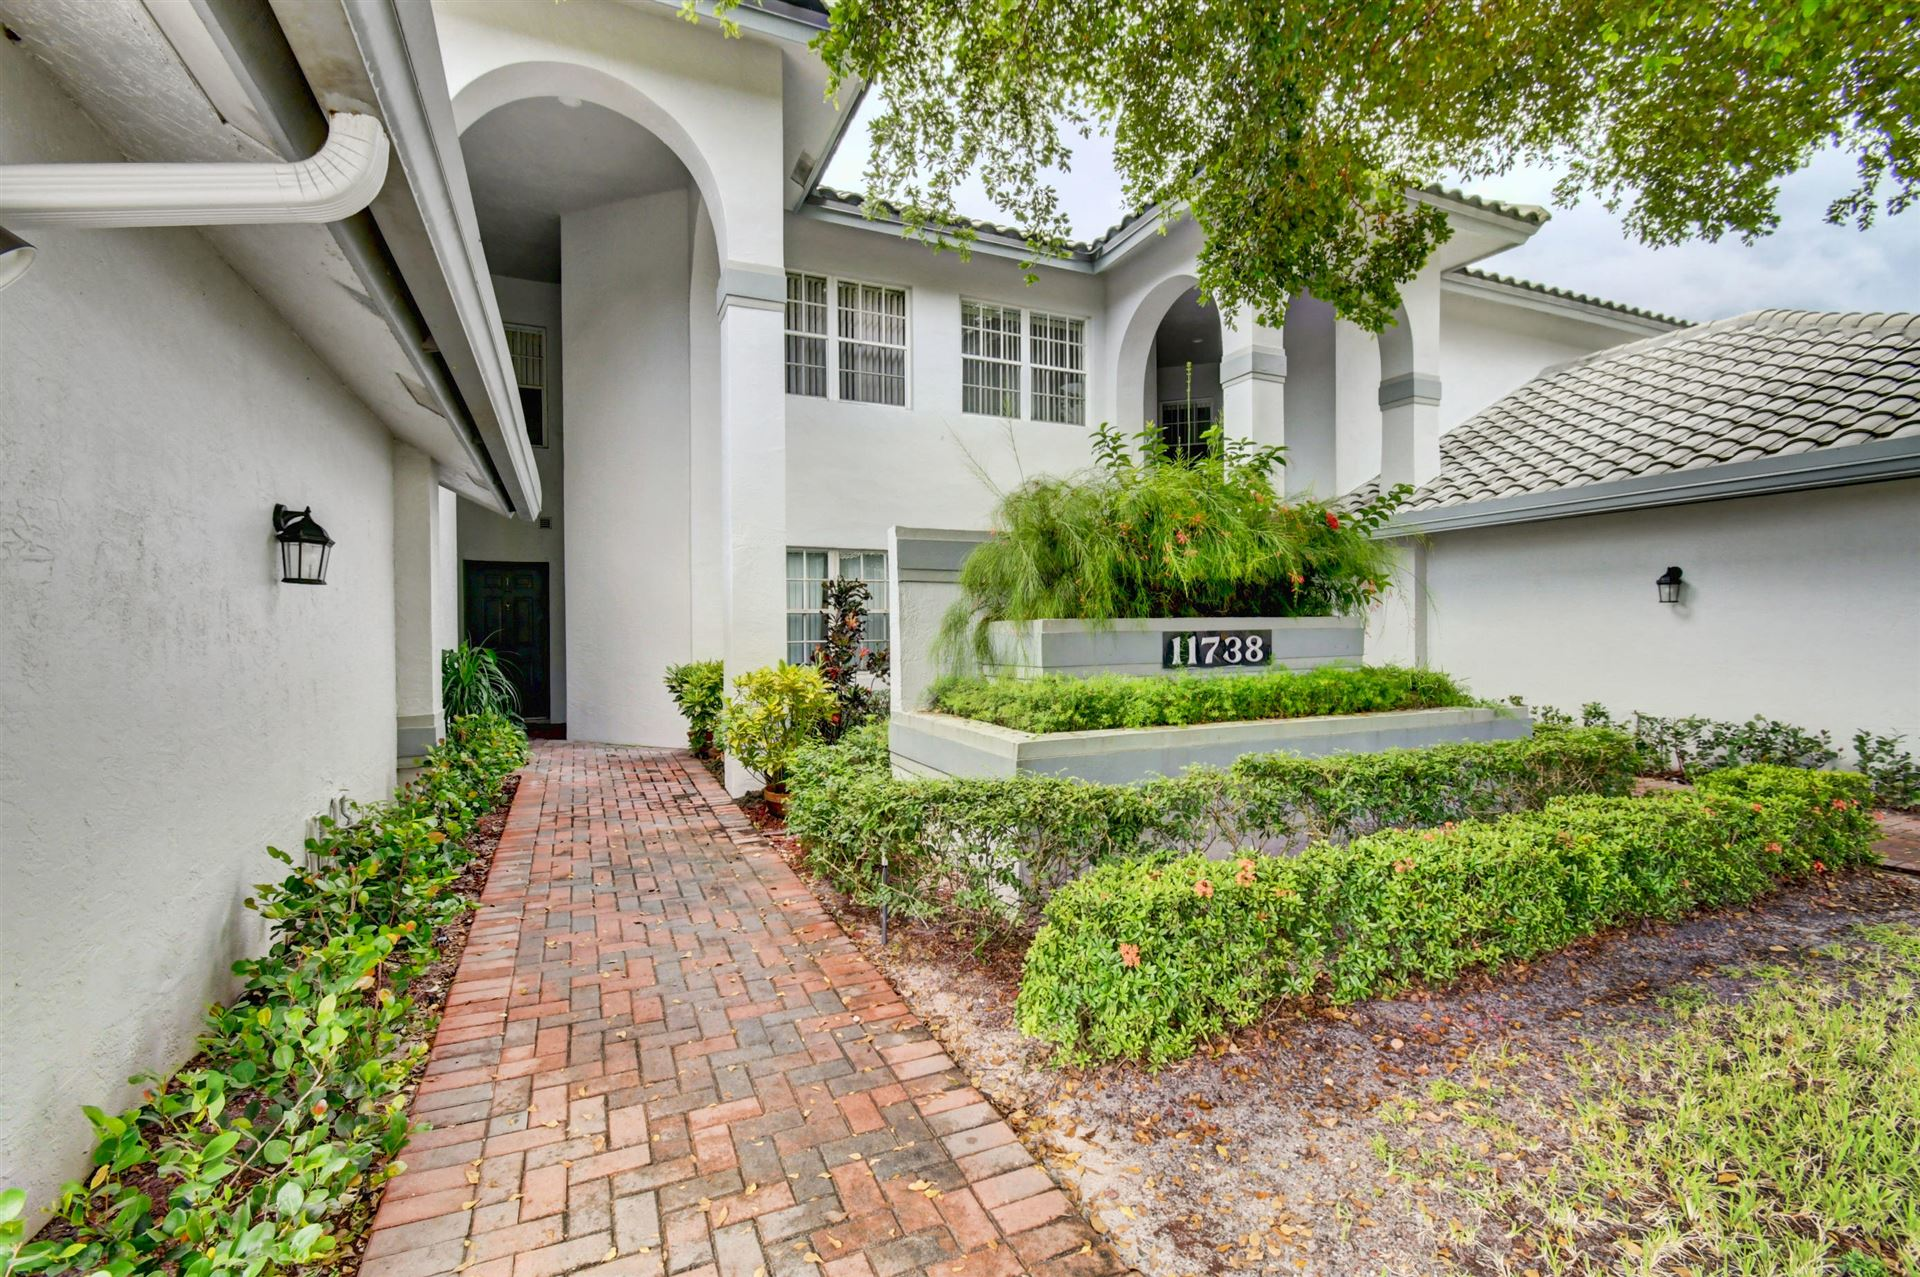 11738 Briarwood Circle #3, Boynton Beach, FL 33437 - #: RX-10663342